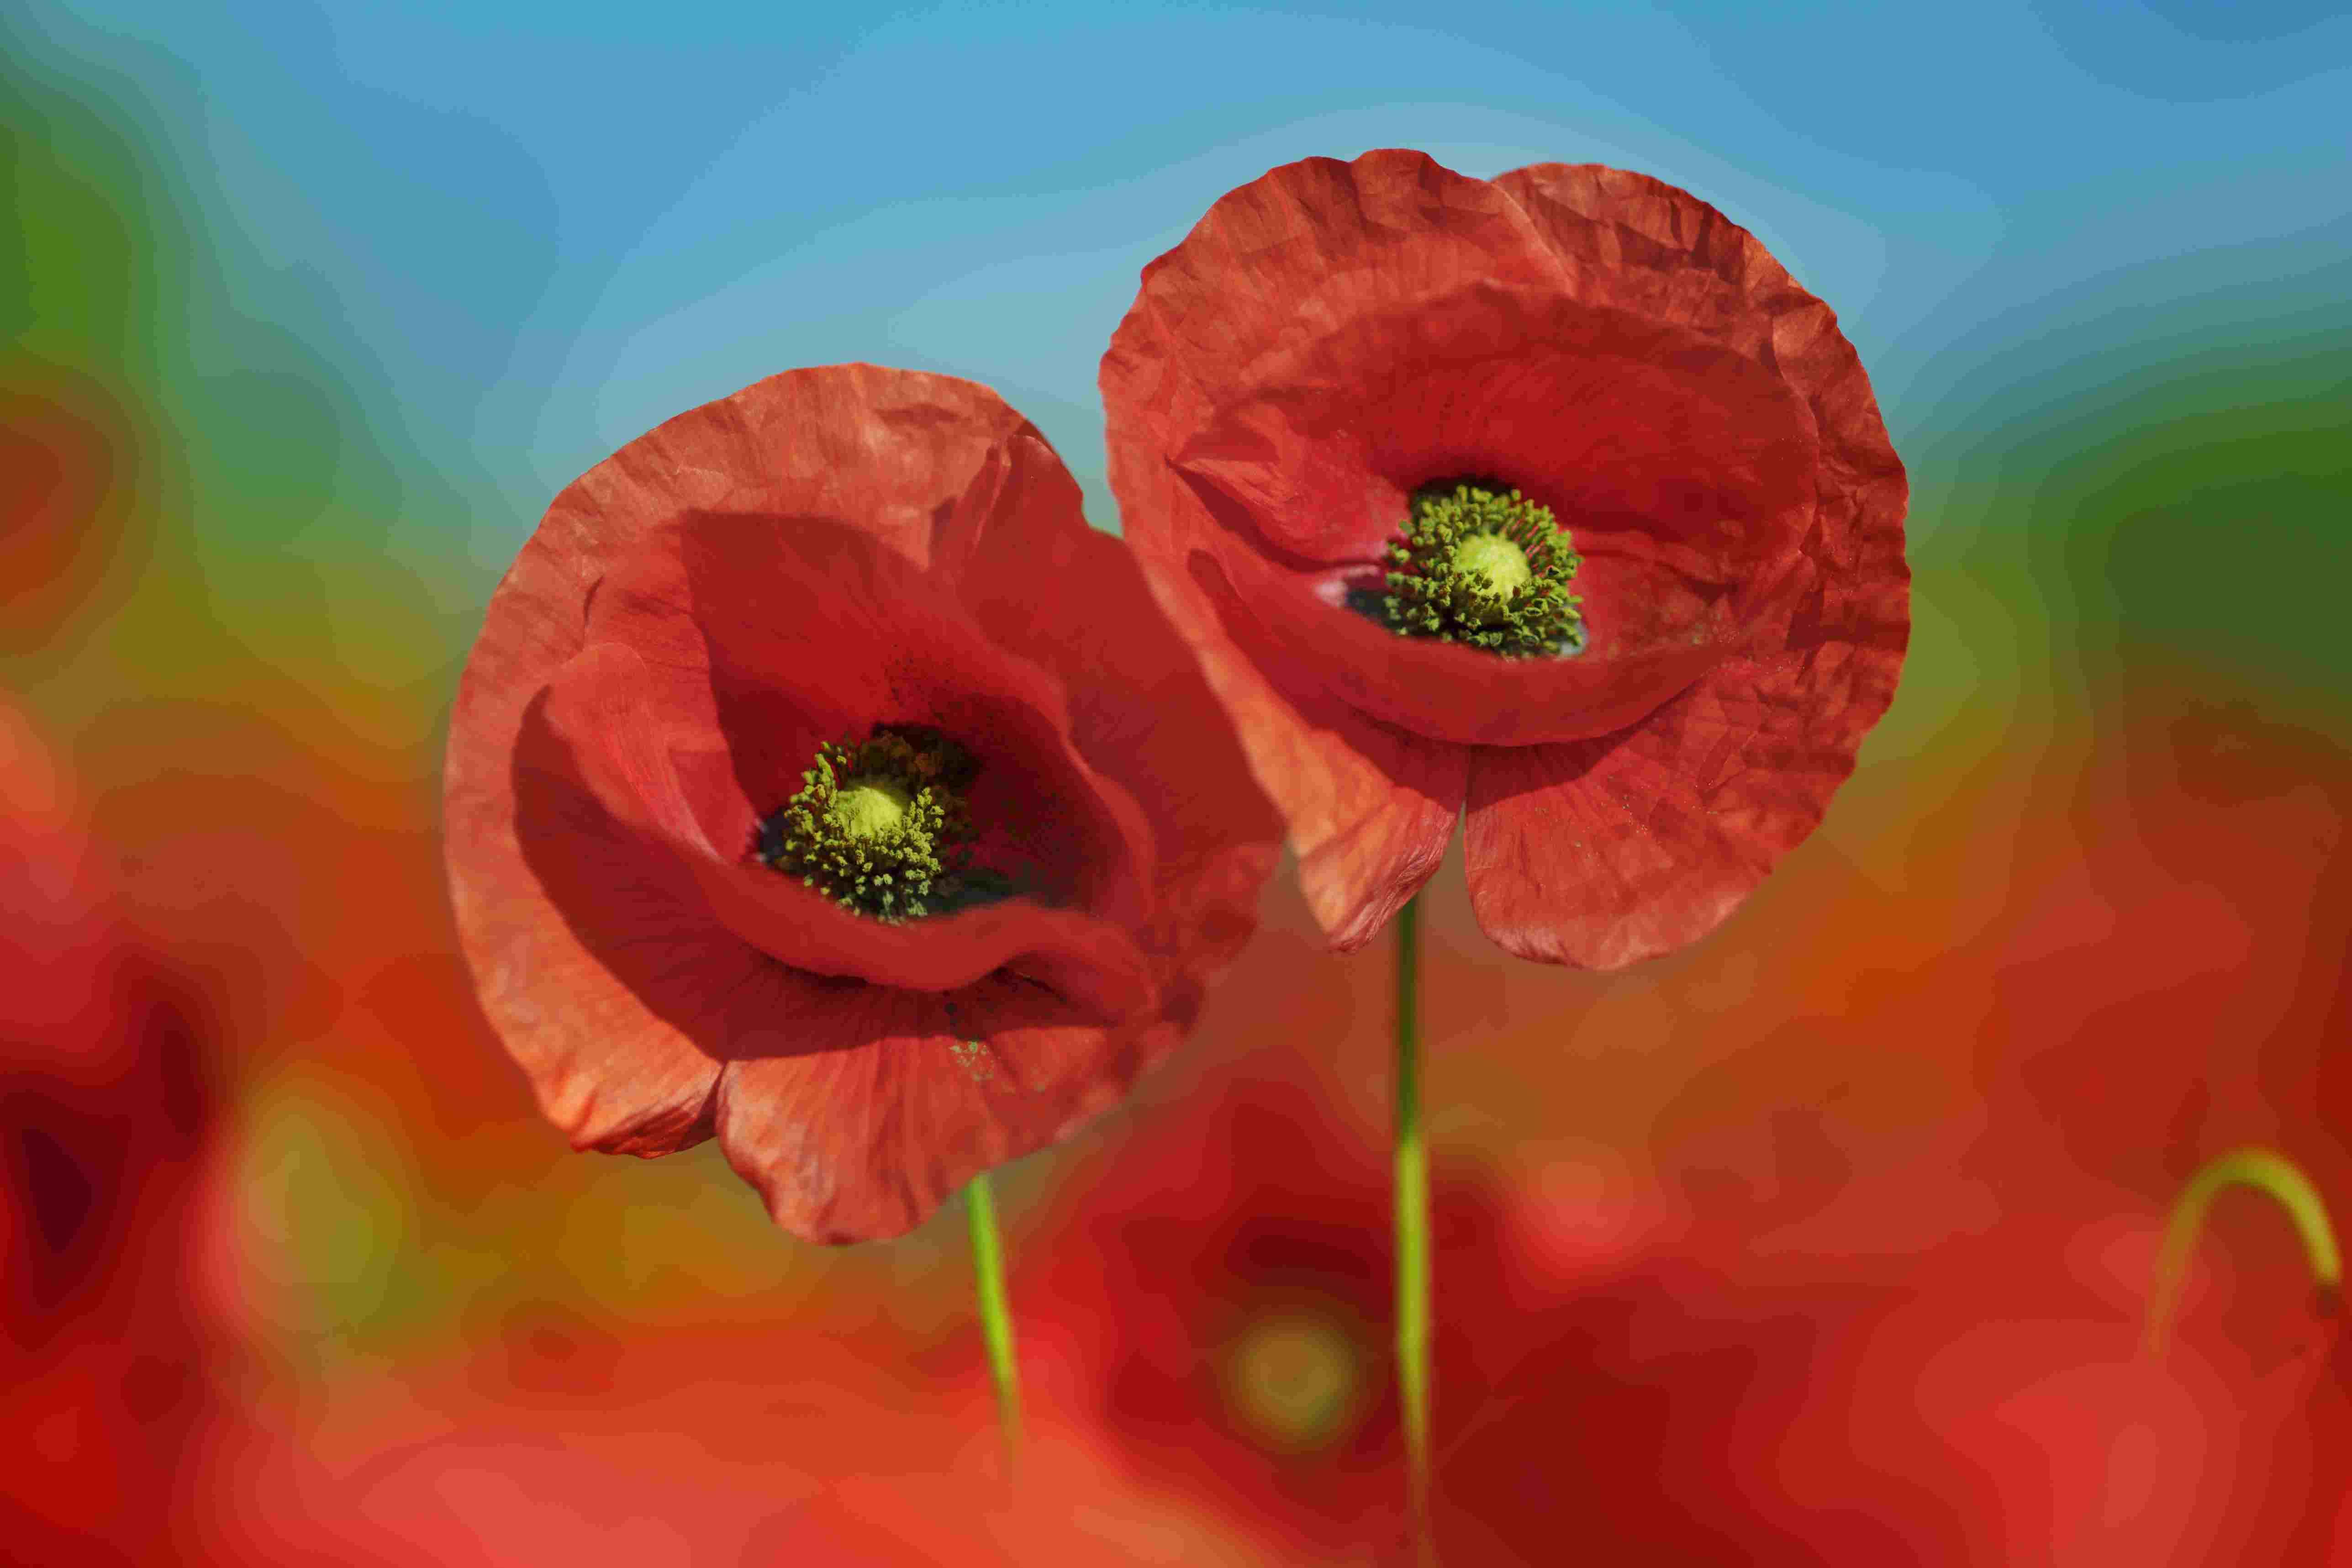 The 10 best garden poppies to grow in every region mightylinksfo